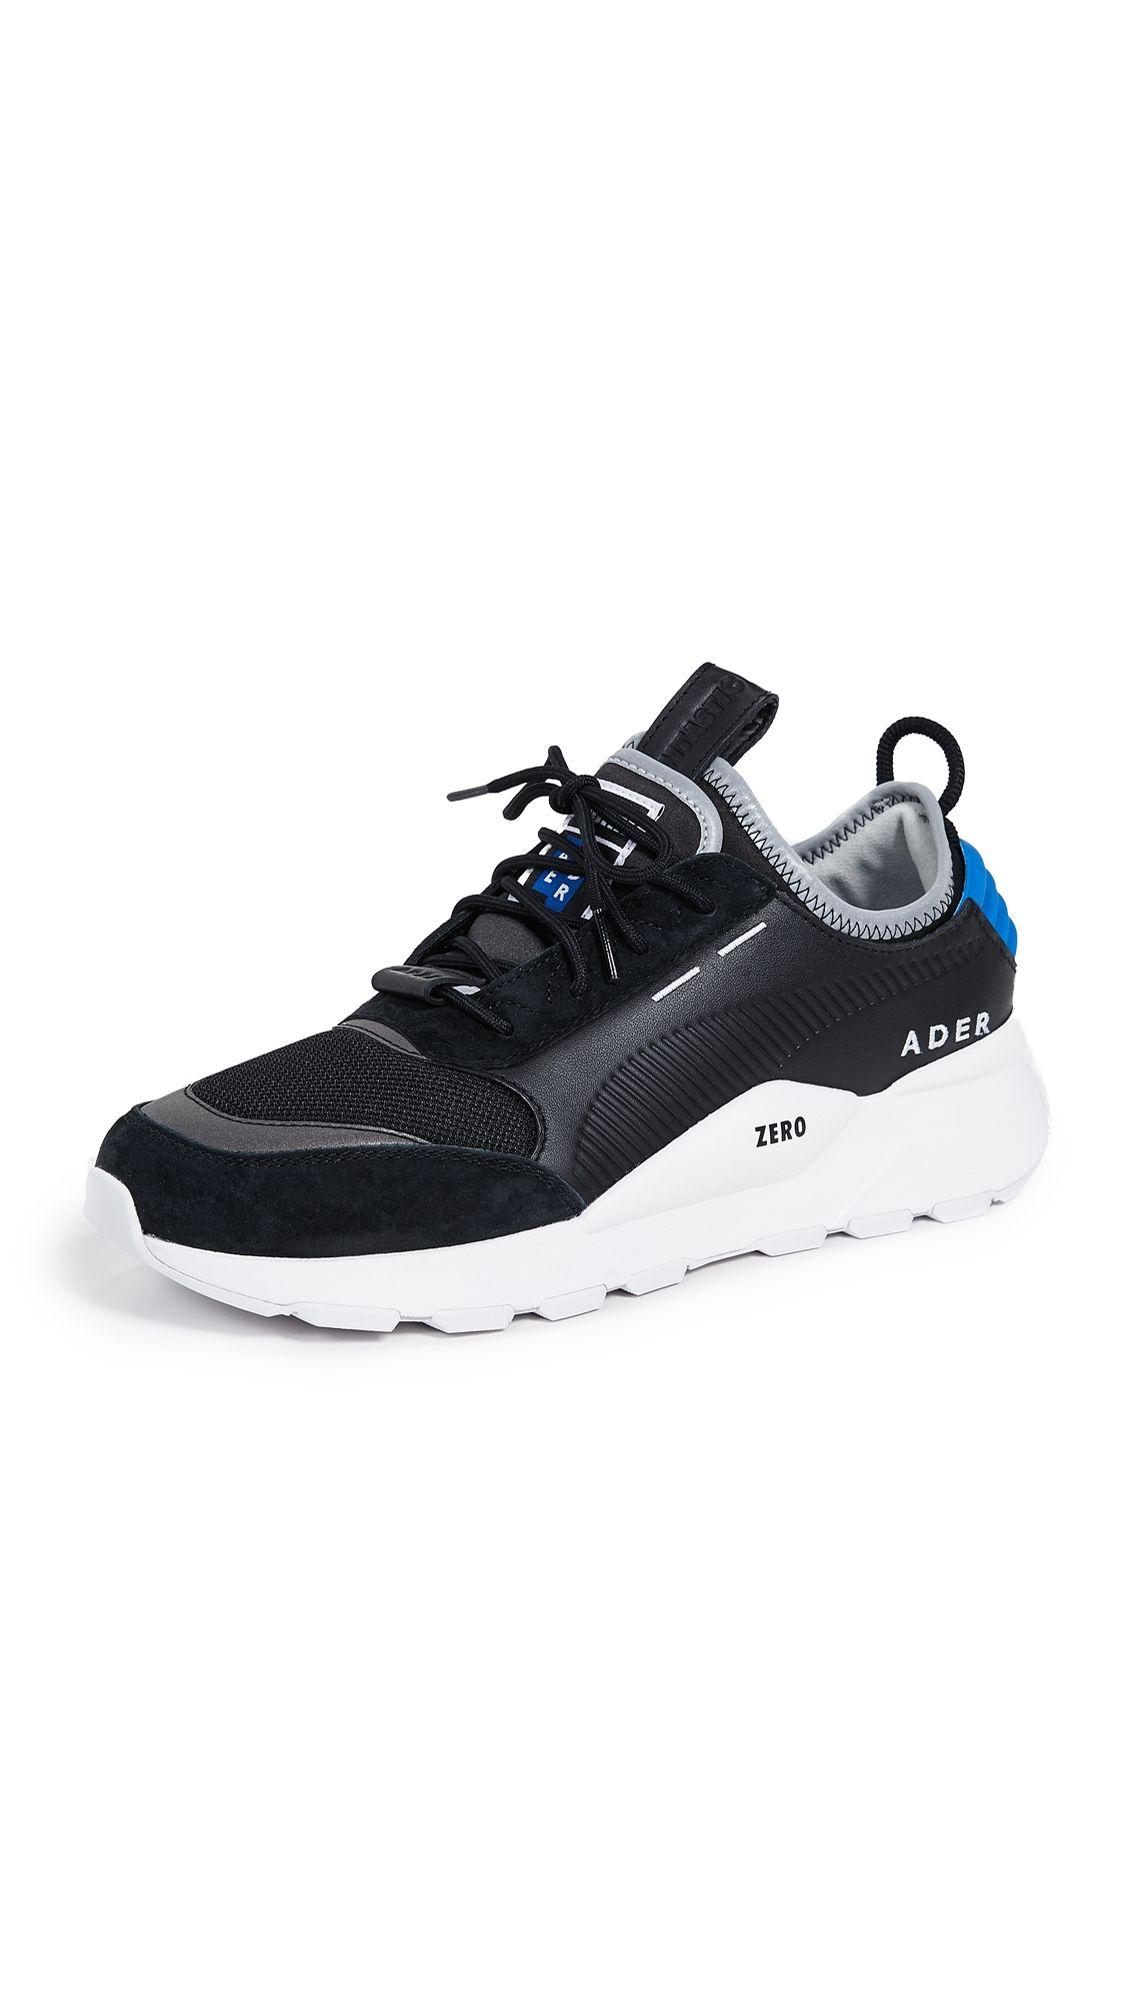 cbad6745f89b1c PUMA RS-0 ADER ERROR SNEAKERS.  puma  shoes